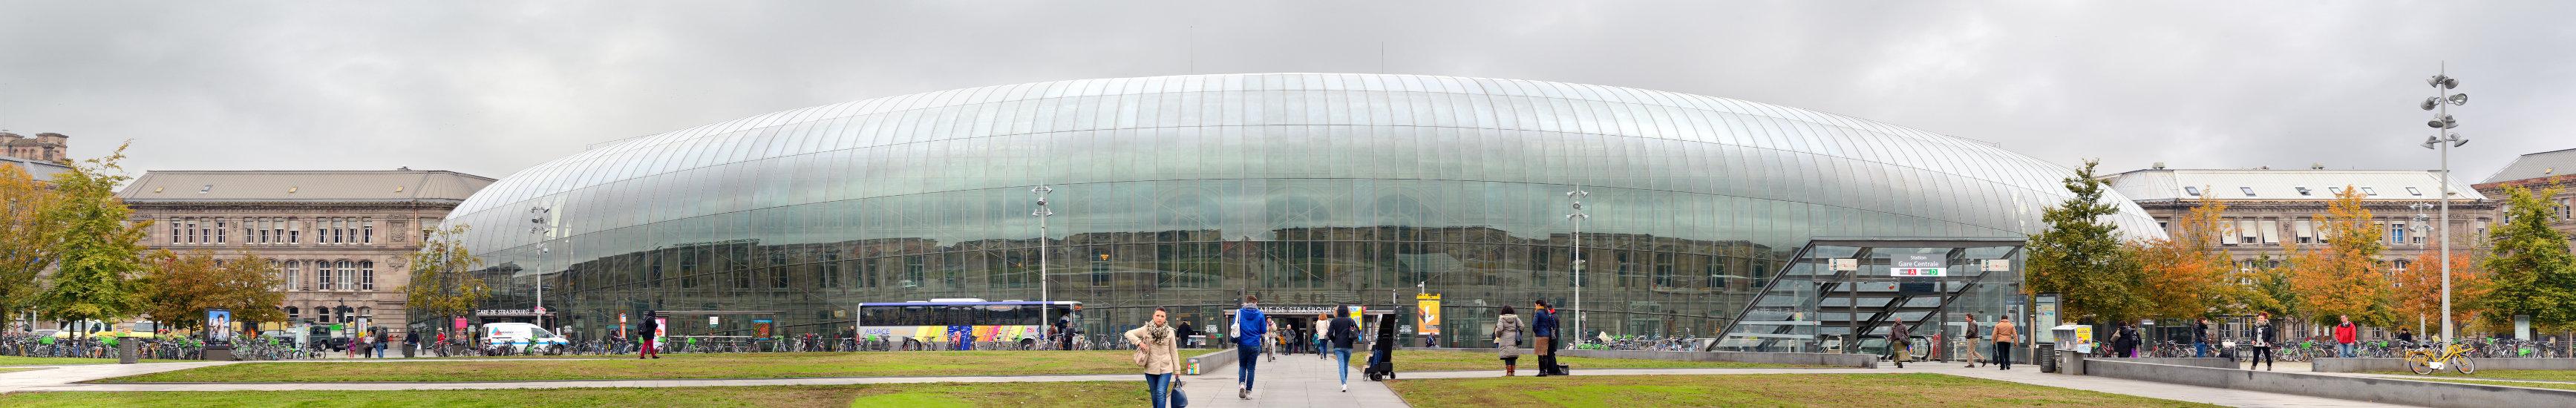 Straßburg Hauptbahnhof | Glasfassade